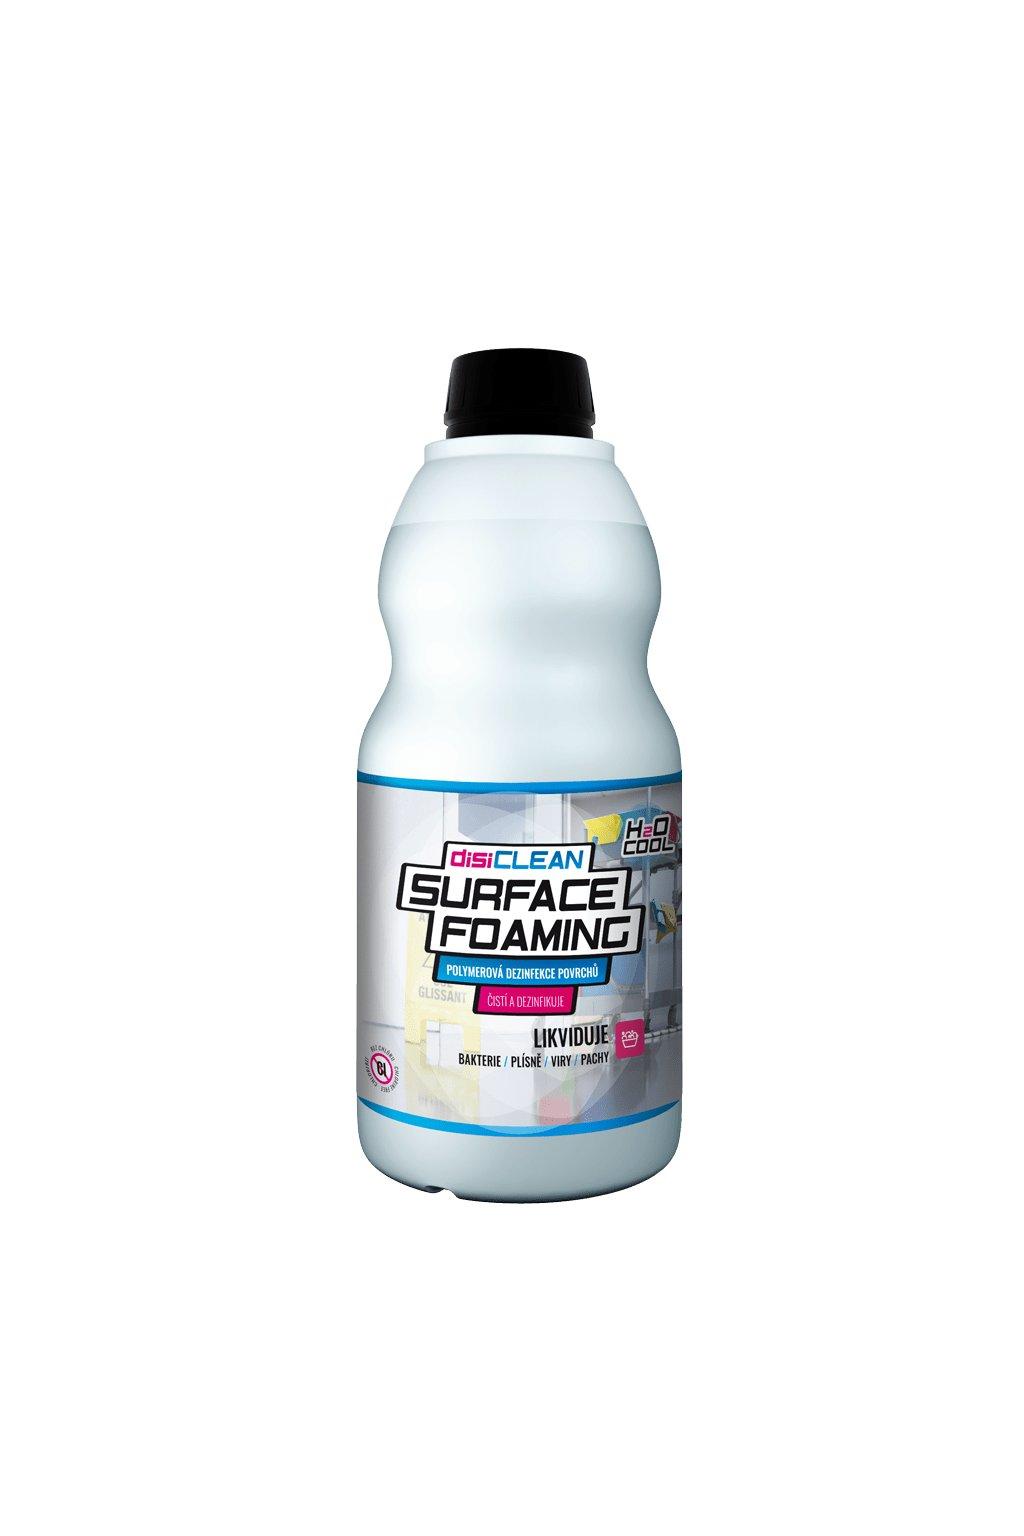 24 bezchlorovy cistici dezinfekcni prostredek disiclean h2o surface foaming 1l